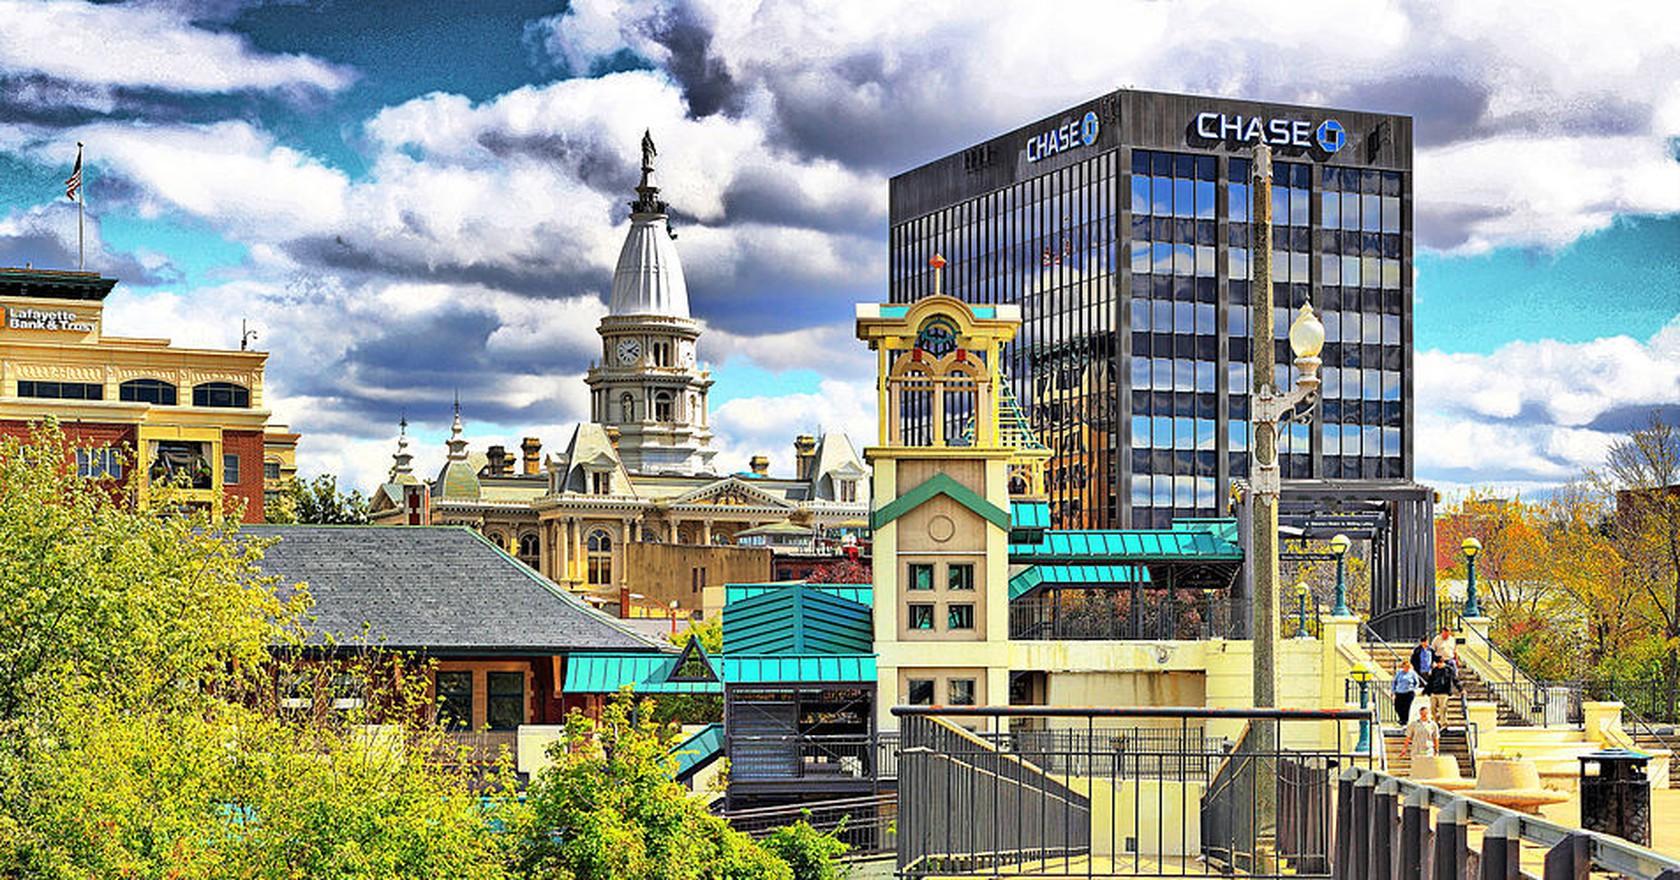 Downtown Lafayette Indiana John Schanlaub Wikicommons